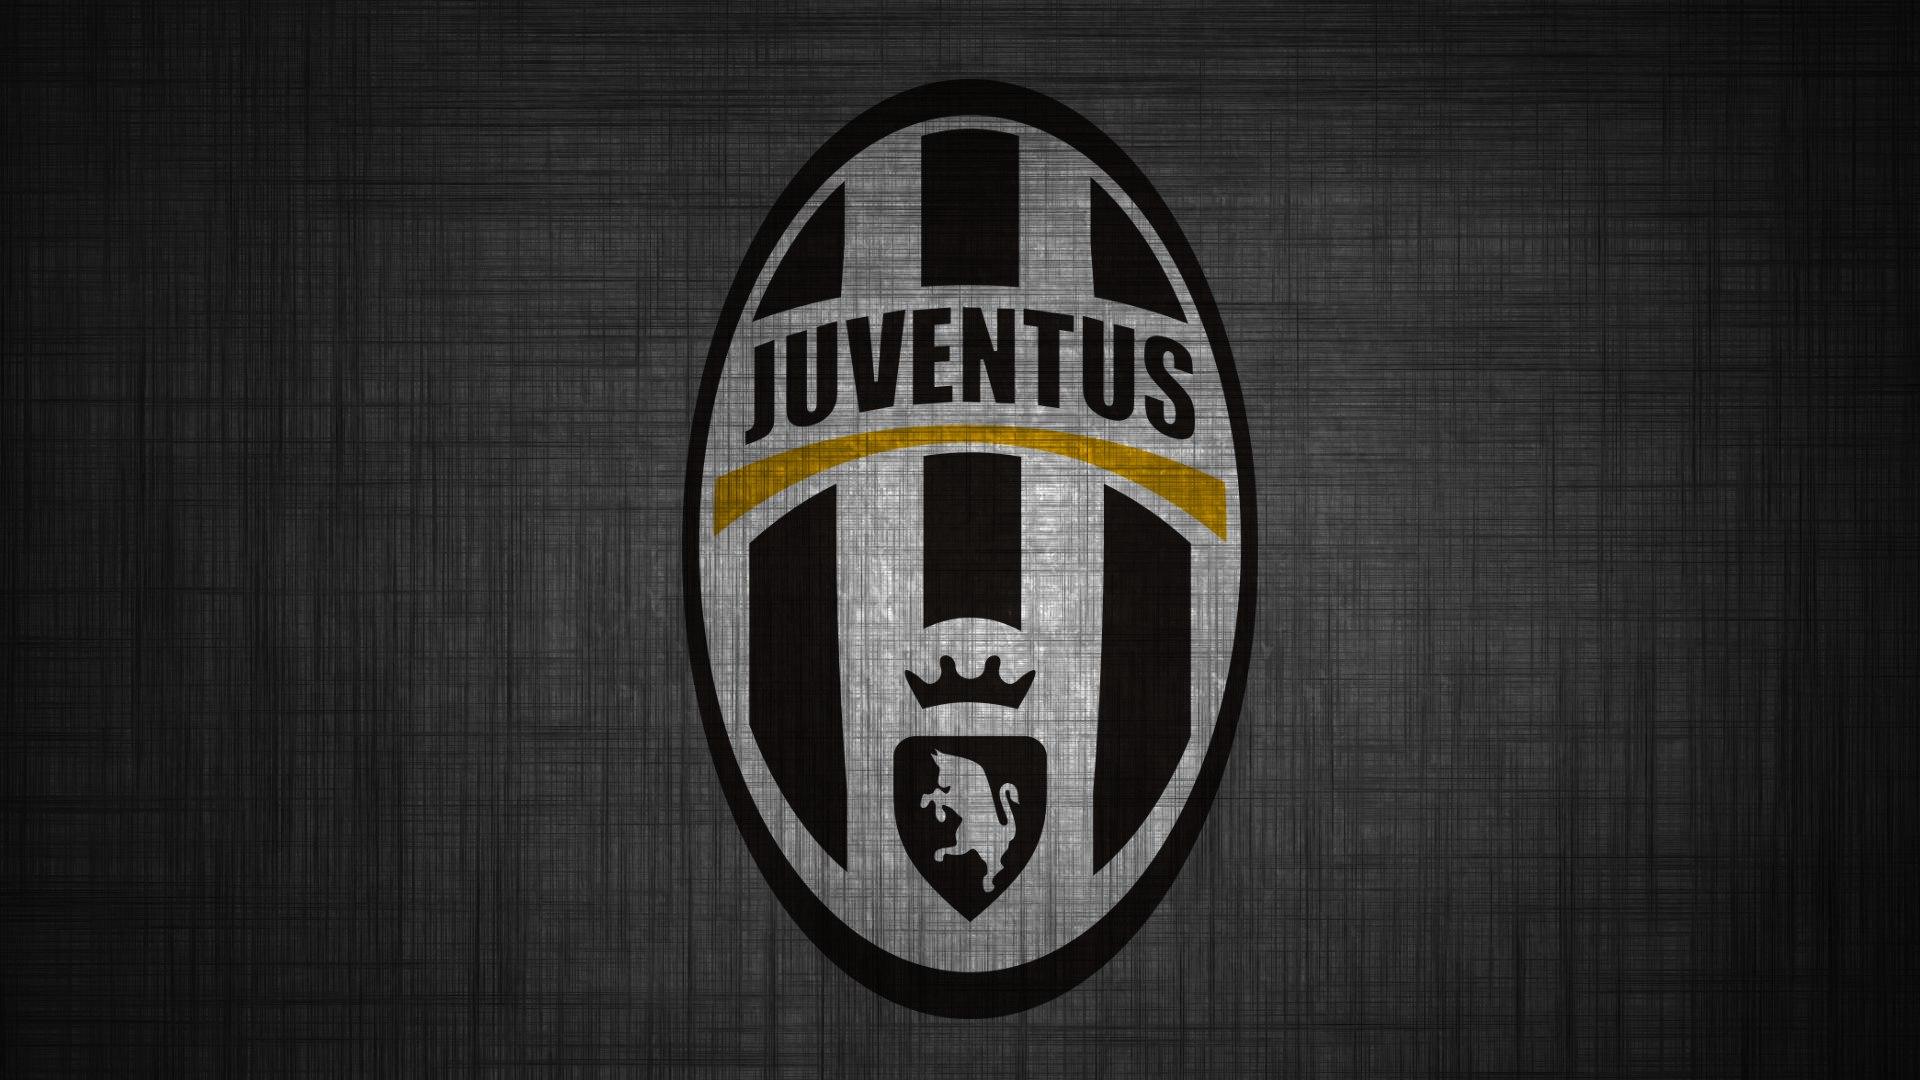 Free Download Gambar Wallpaper Juventus Hd 2015 2016 Gambar